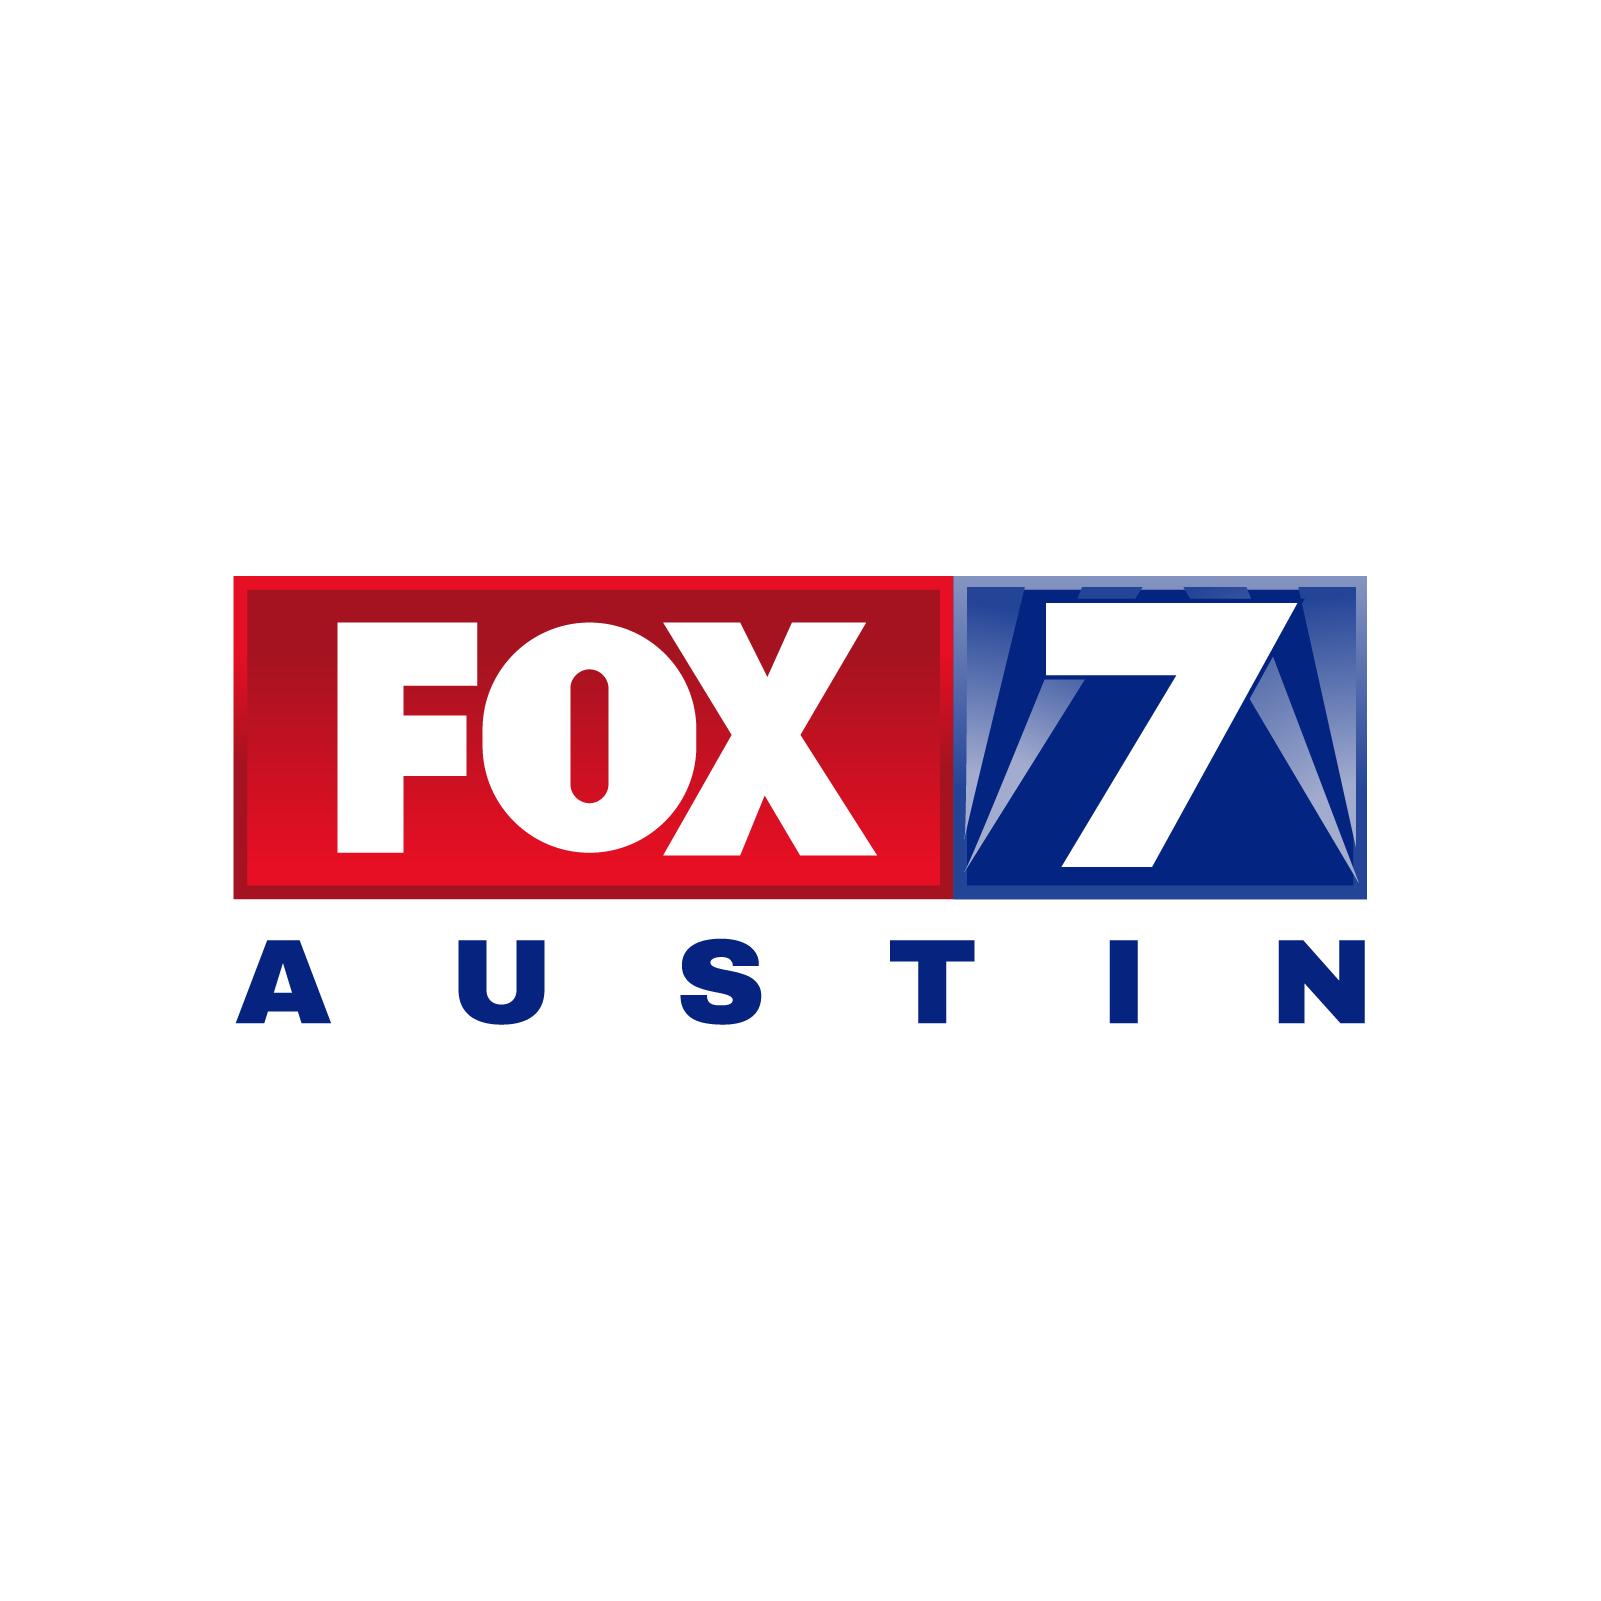 Press Logos_Fox News 7 Austin.png